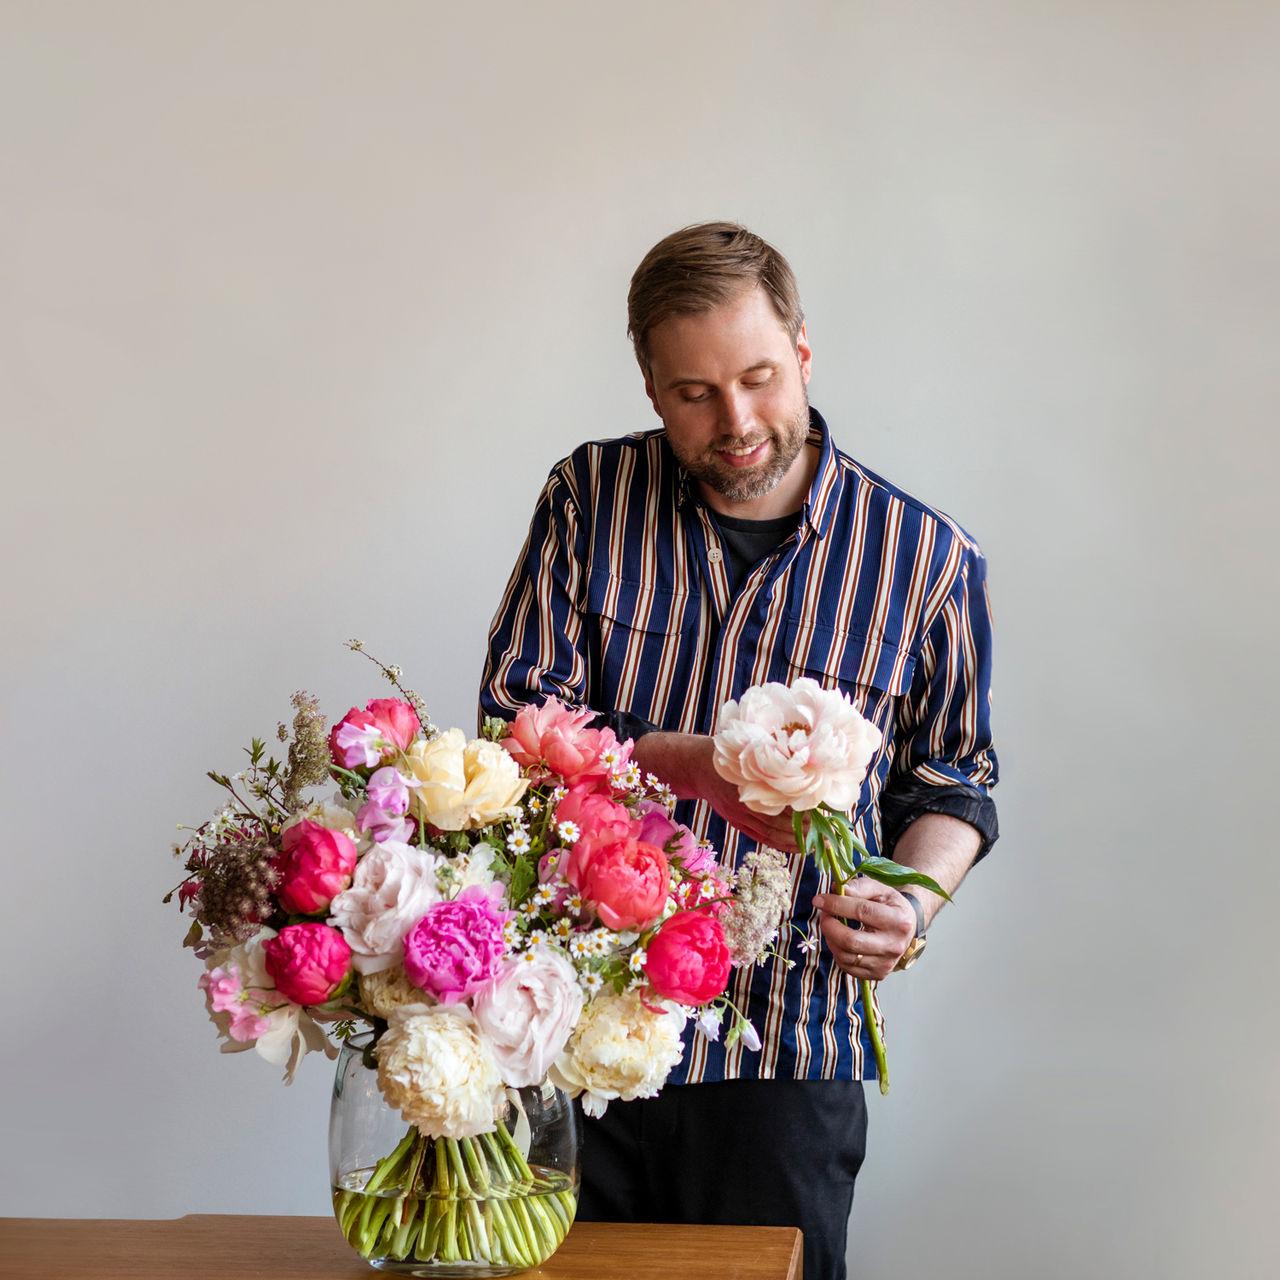 Interflora lanserar Mästerflorist